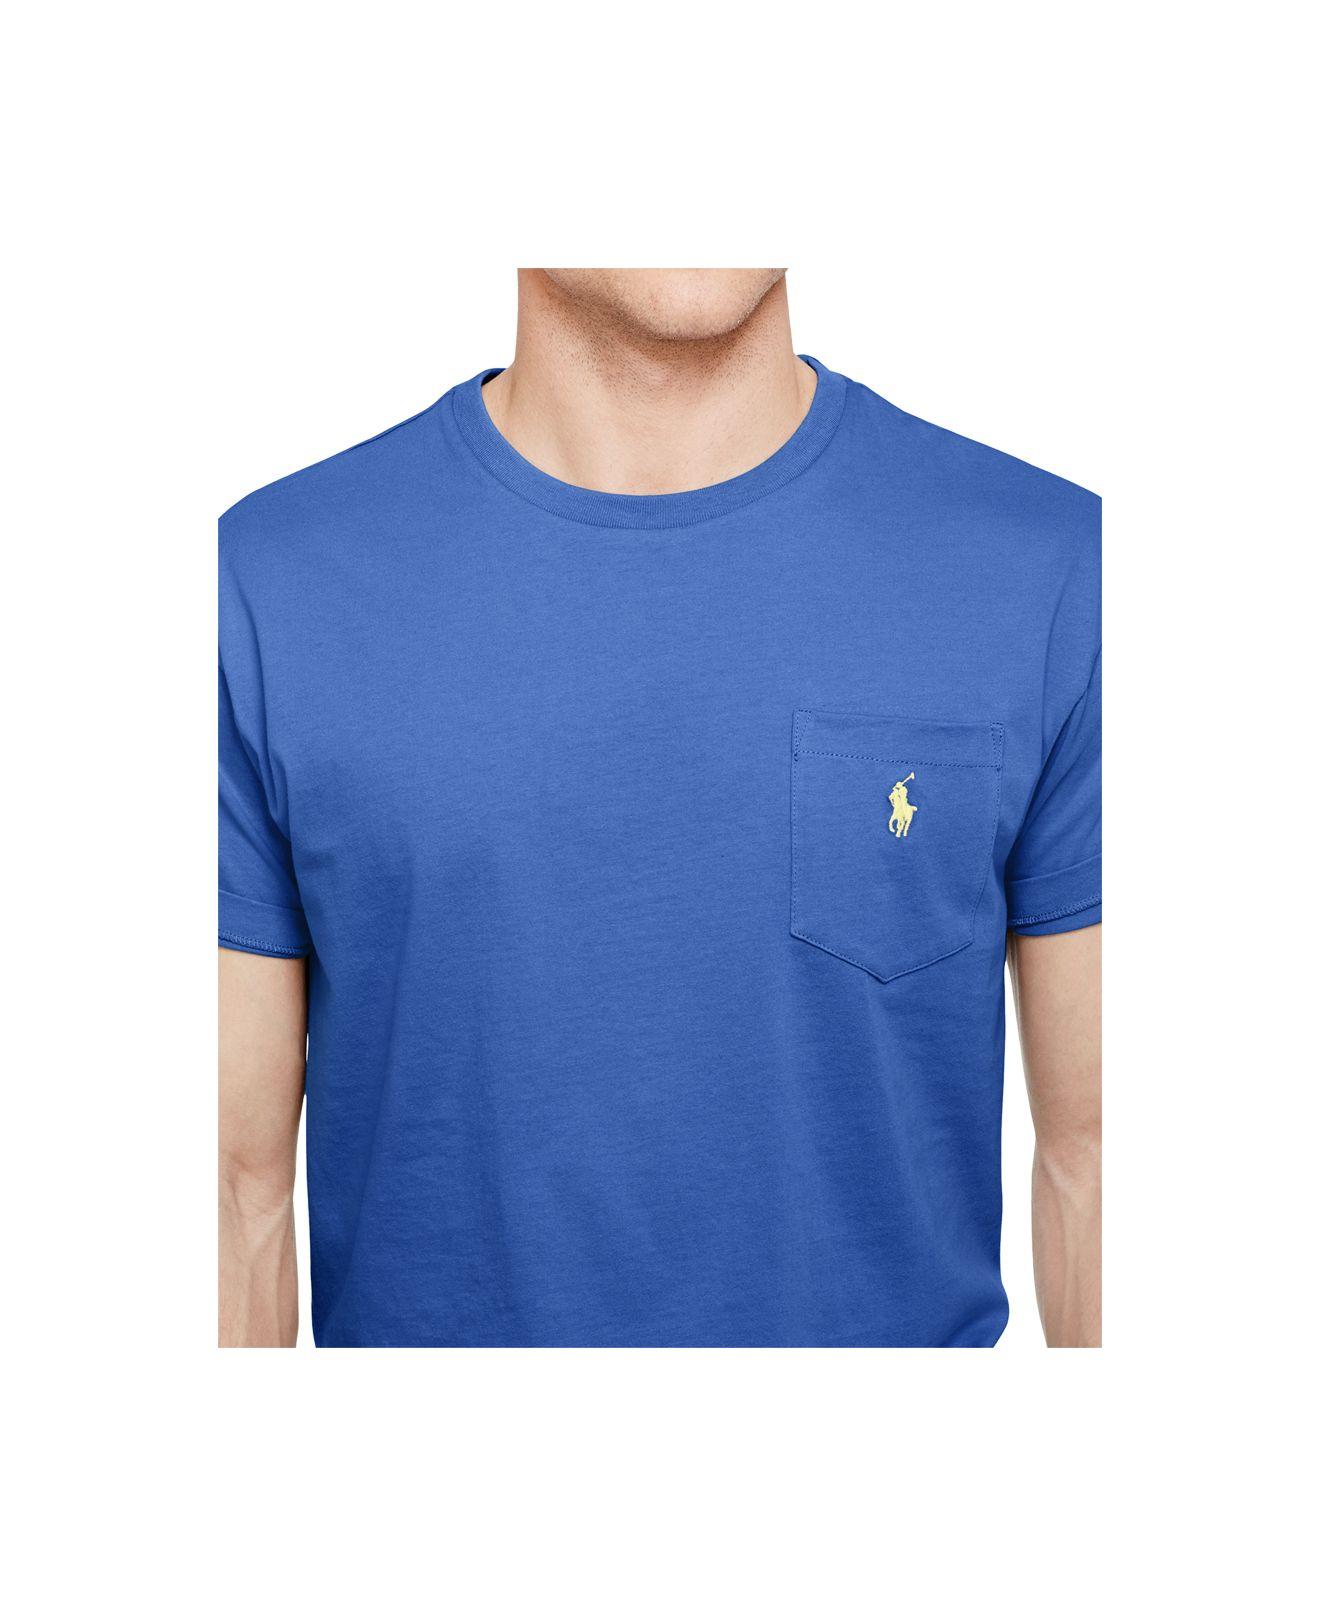 polo ralph lauren crew neck pocket t shirt in blue for men. Black Bedroom Furniture Sets. Home Design Ideas